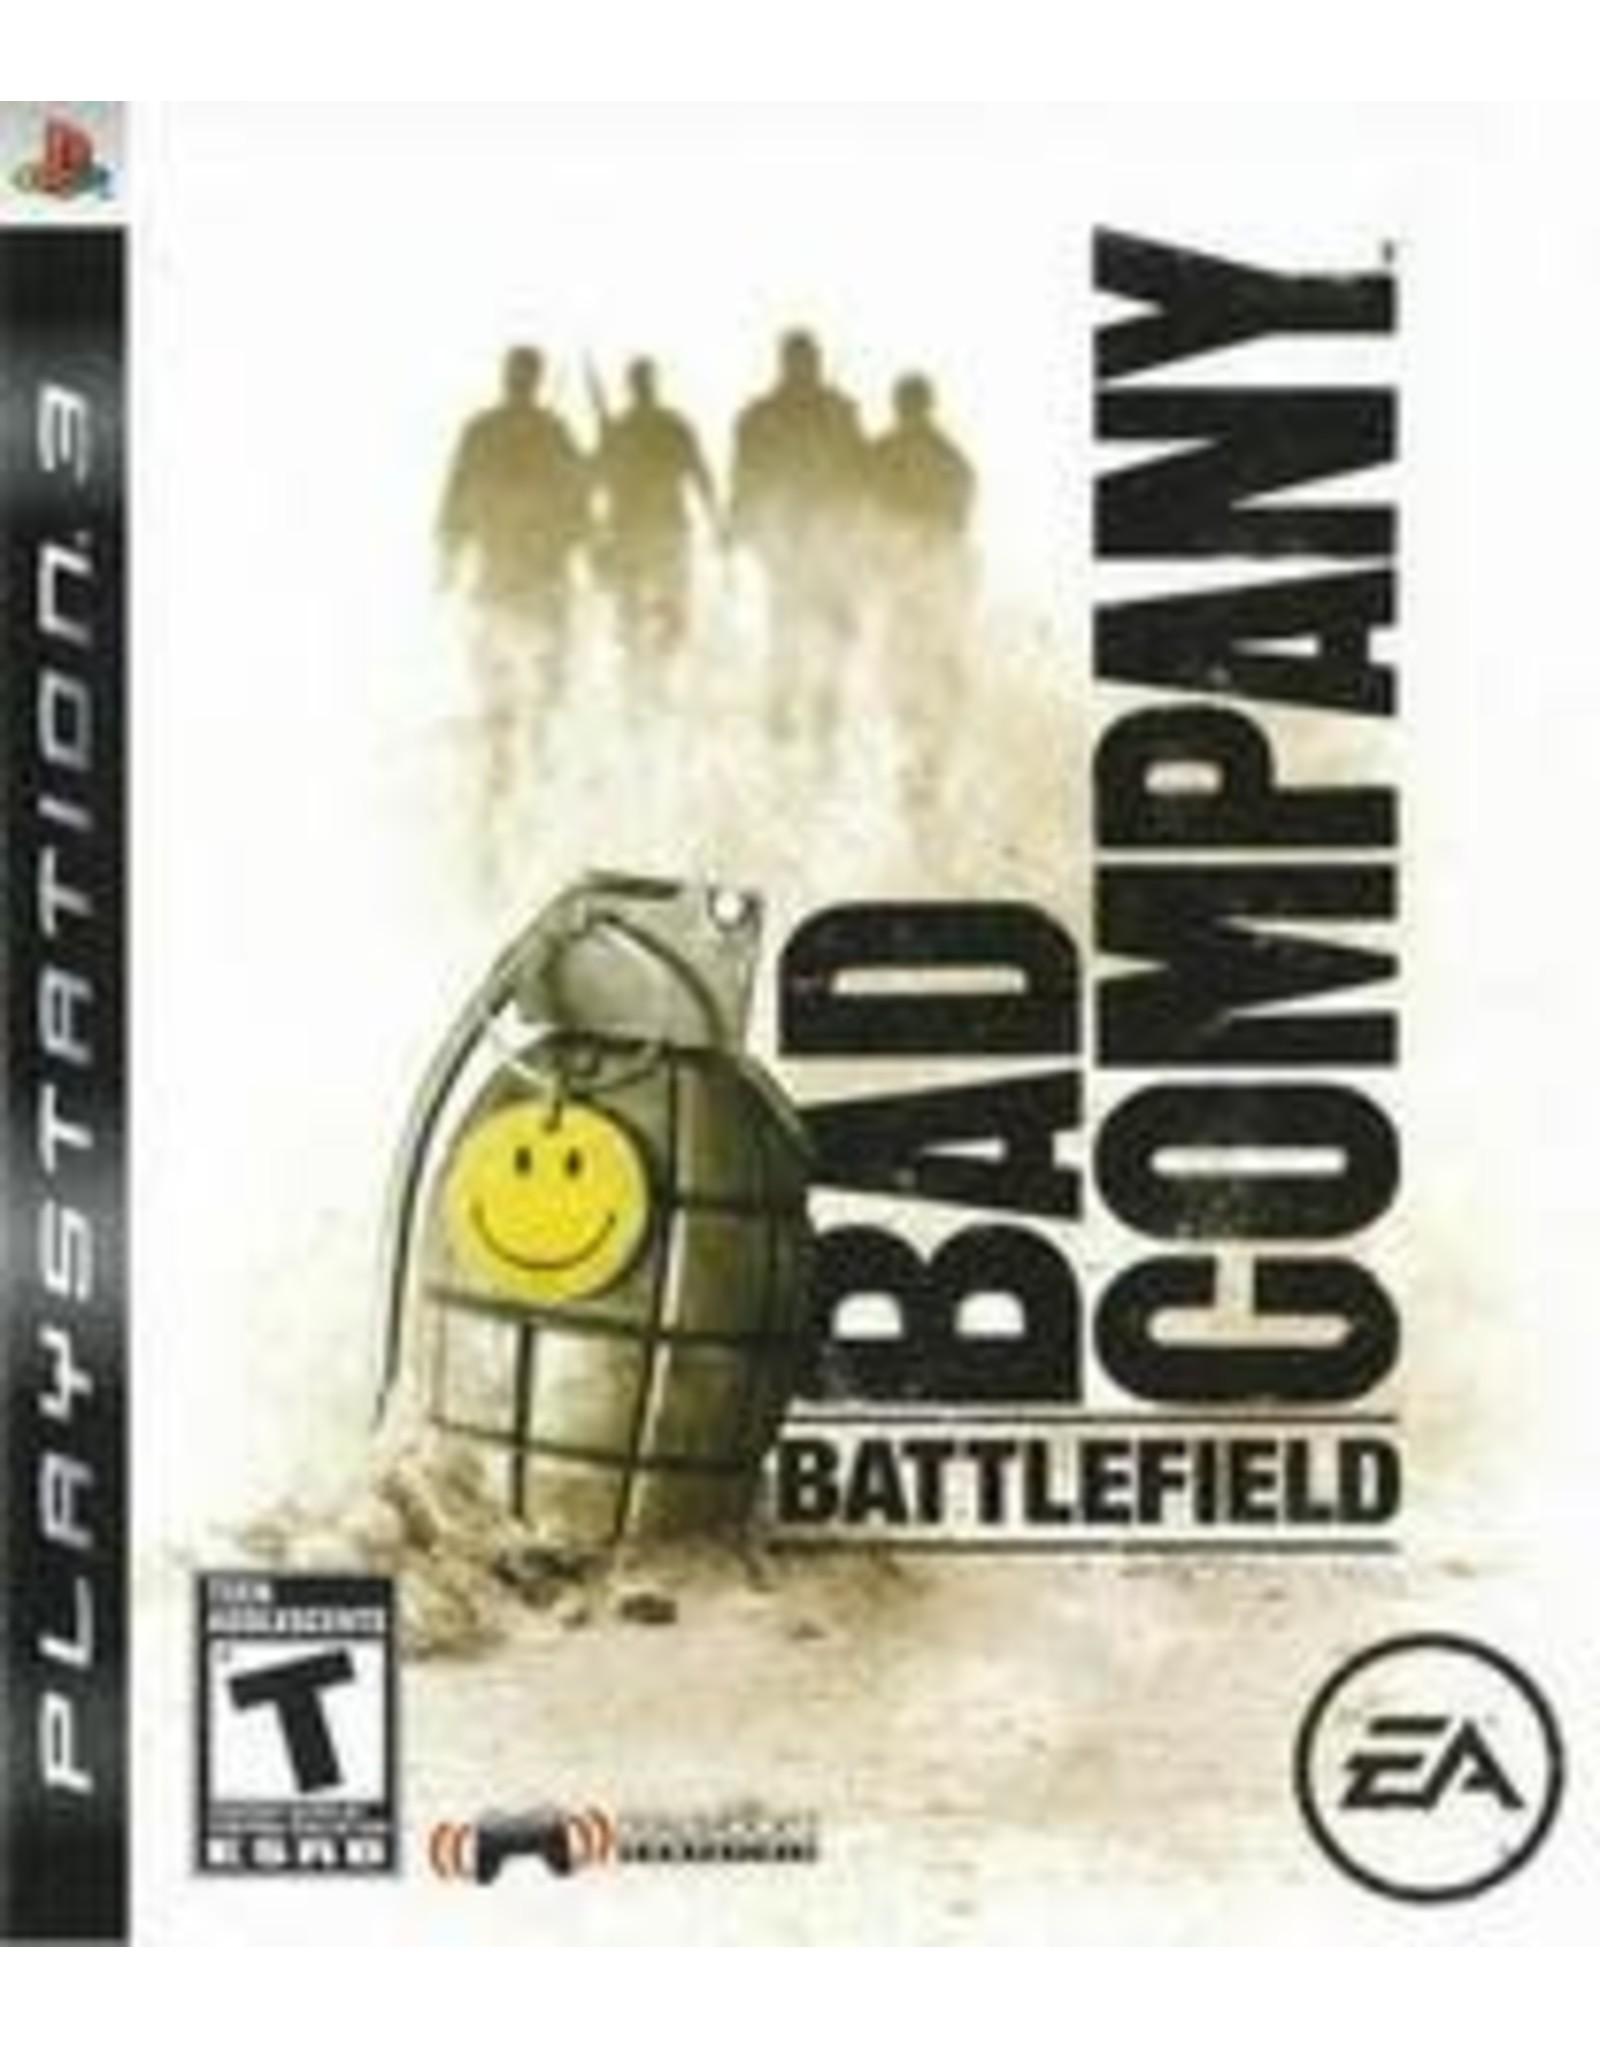 Playstation 3 Battlefield Bad Company (CiB)